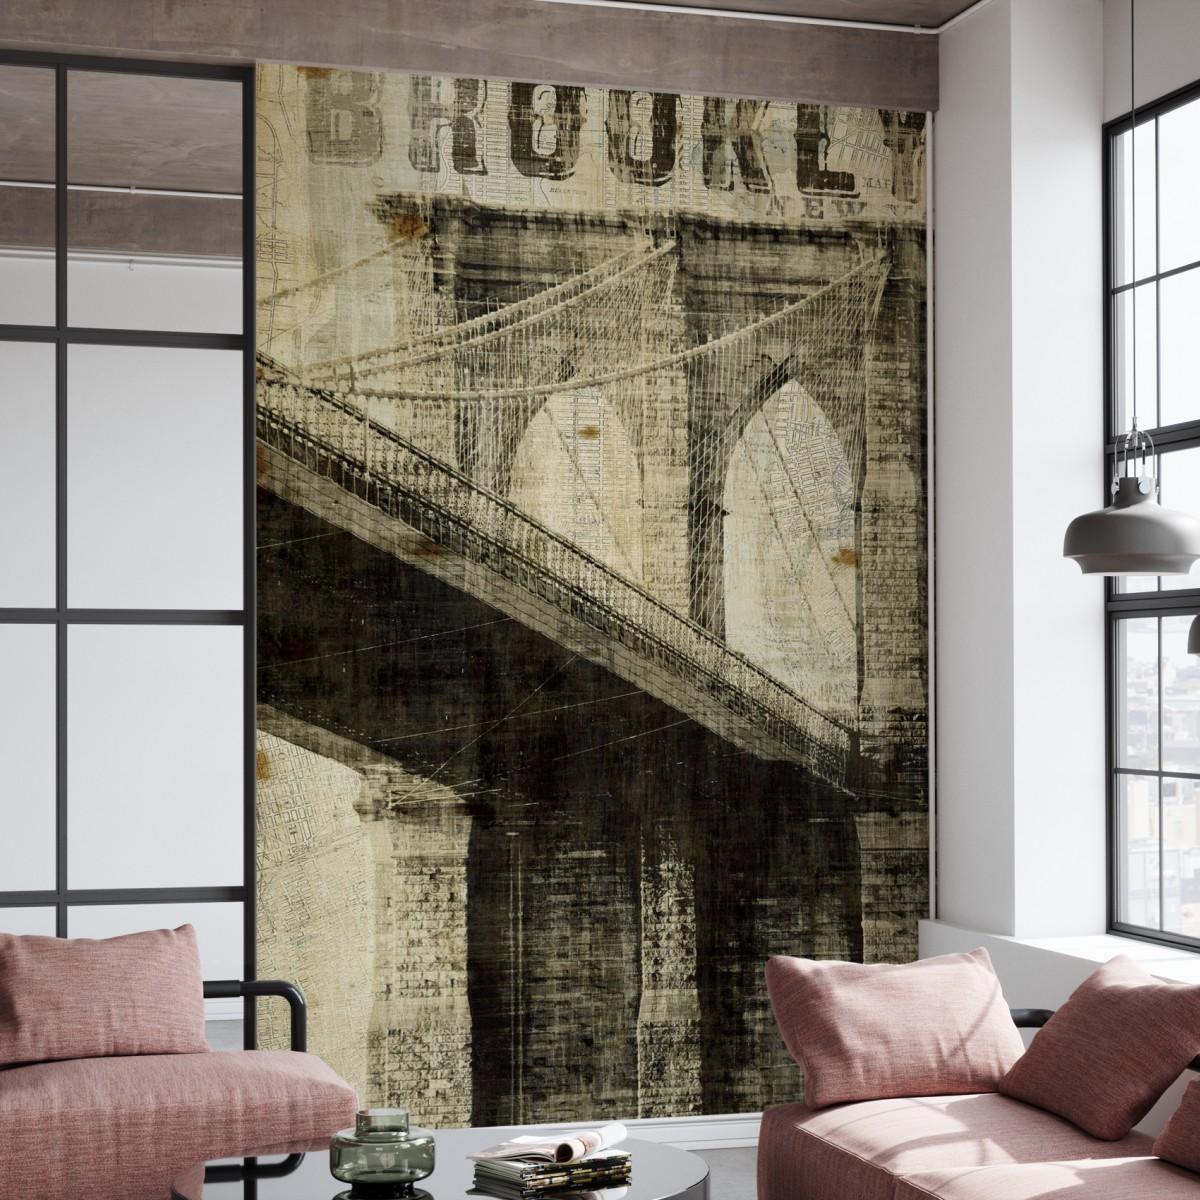 Fototapet Vintage New York Brooklyn Bridge 1, personalizat, Photowall